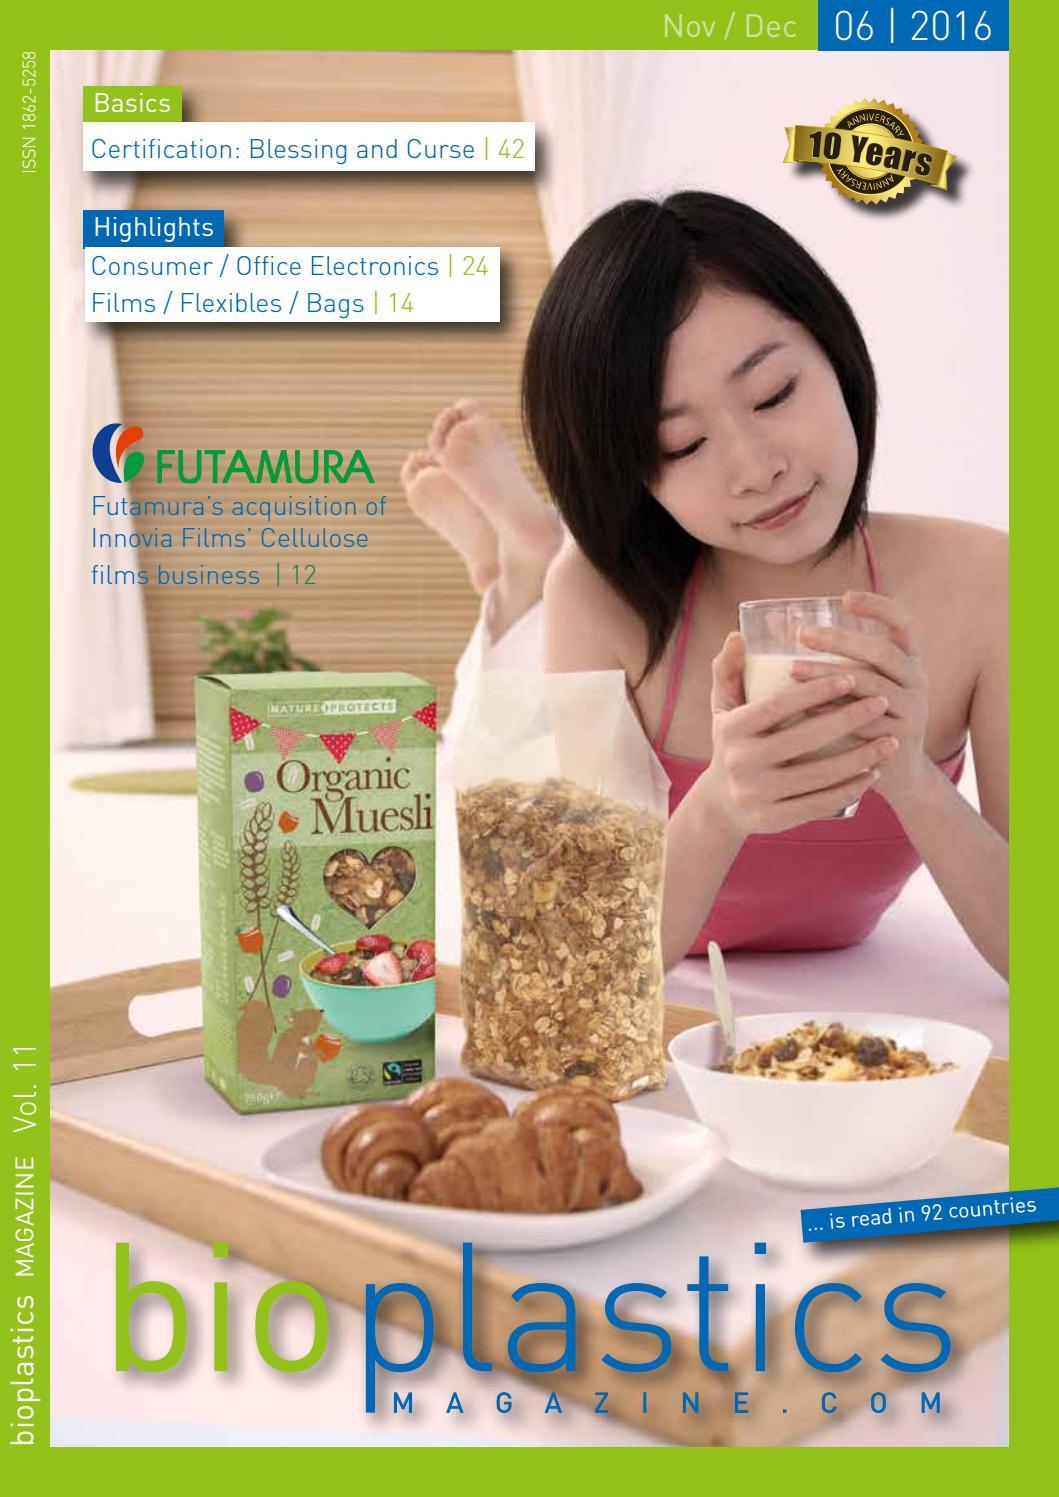 bioplastics magazine by bioplastics magazine issuu